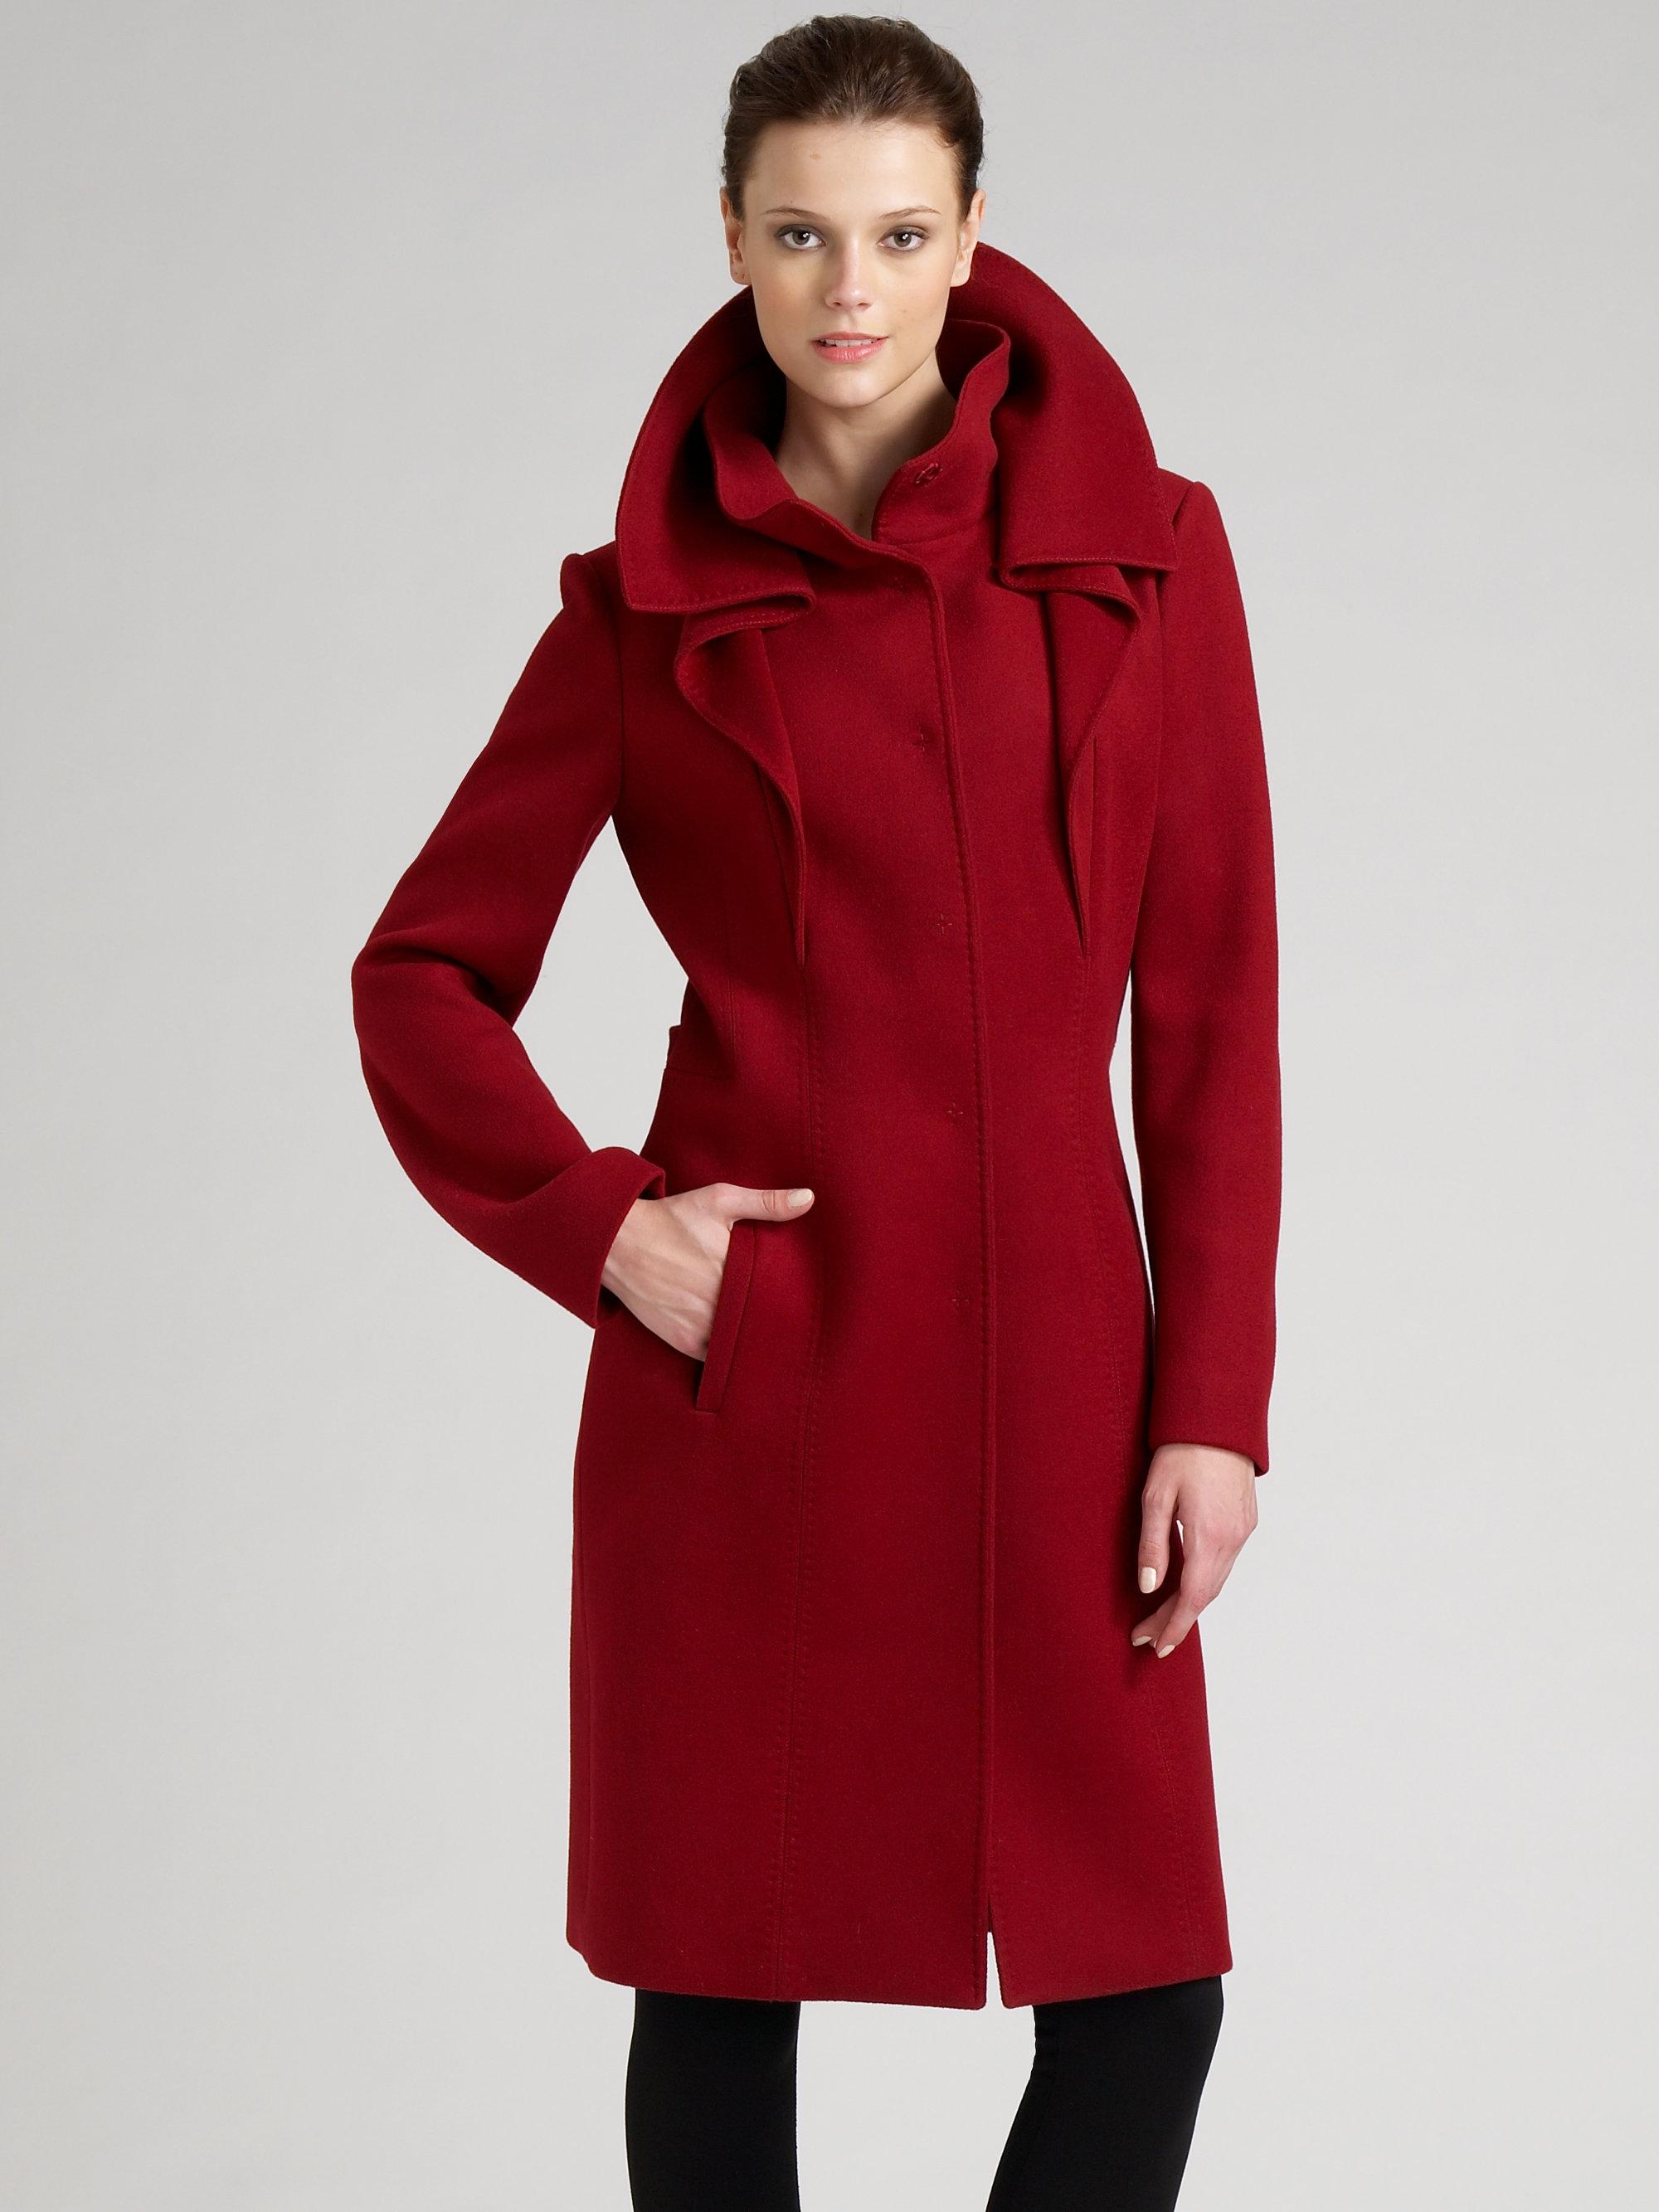 Elie tahari Adriel Doubleface Wool Coat in Red | Lyst